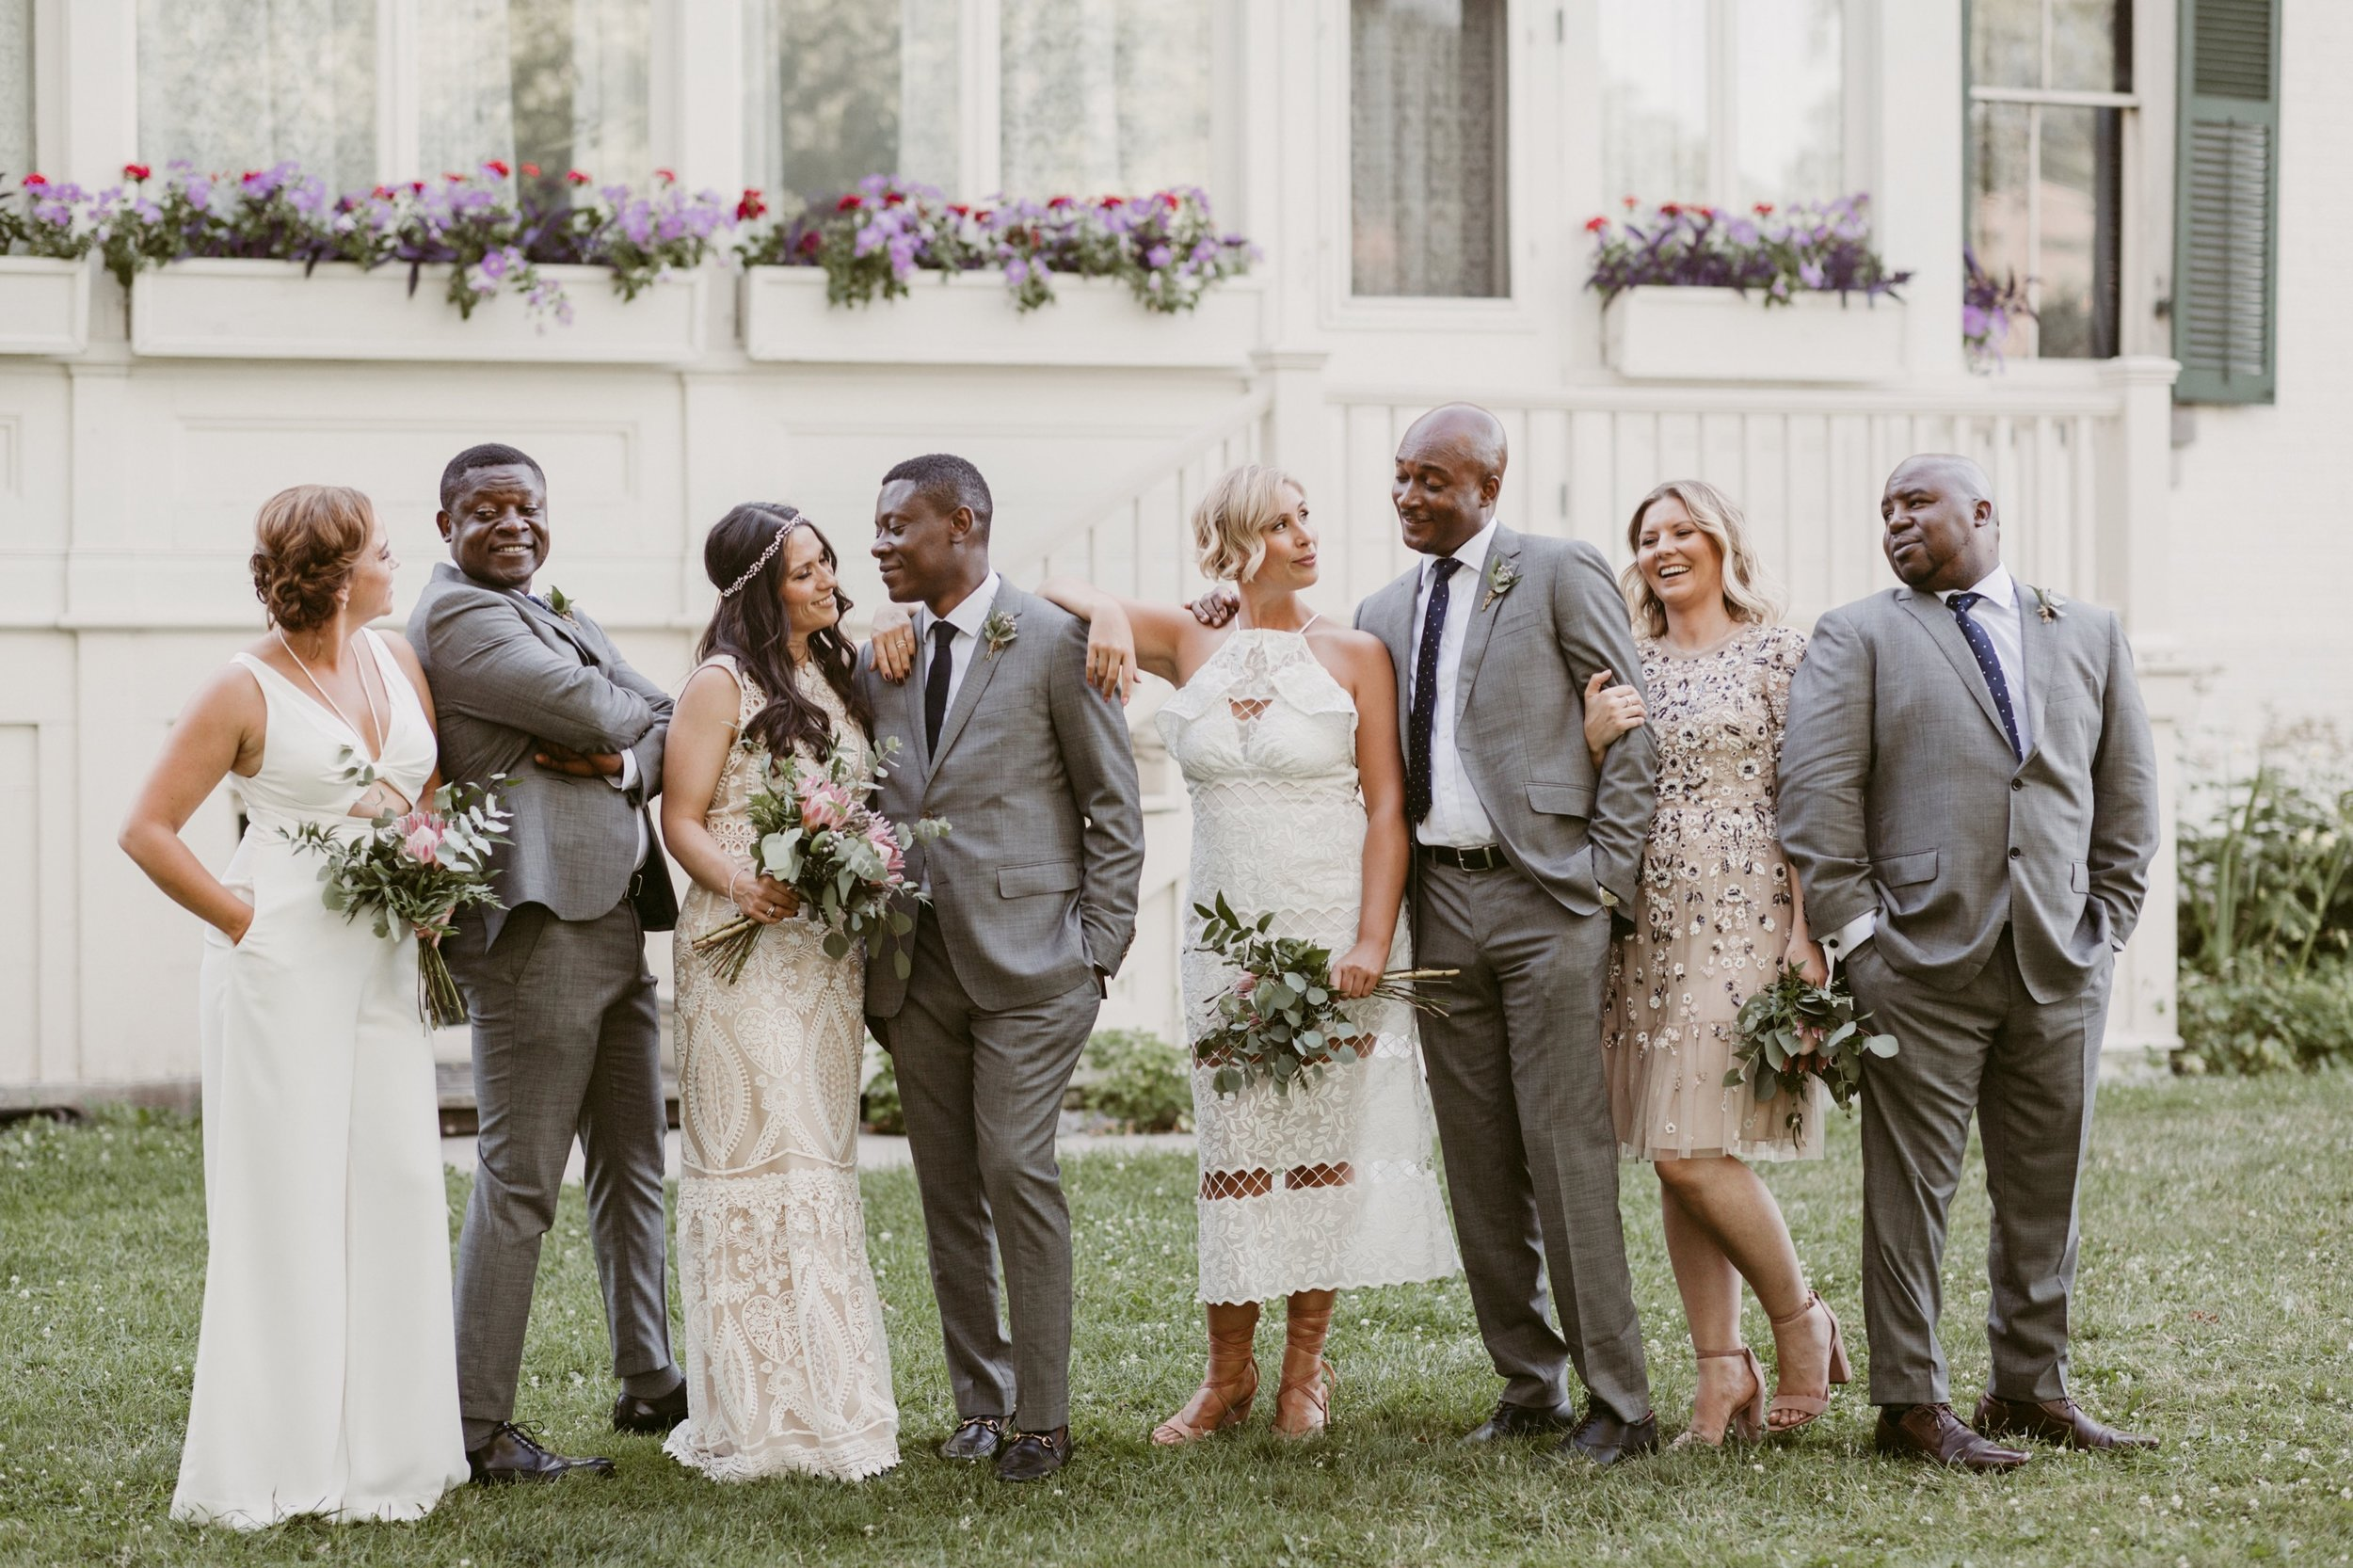 042_Spadina House Wedding (277 of 748)_House_Spadina_intimate_Toronto_Wedding.jpg